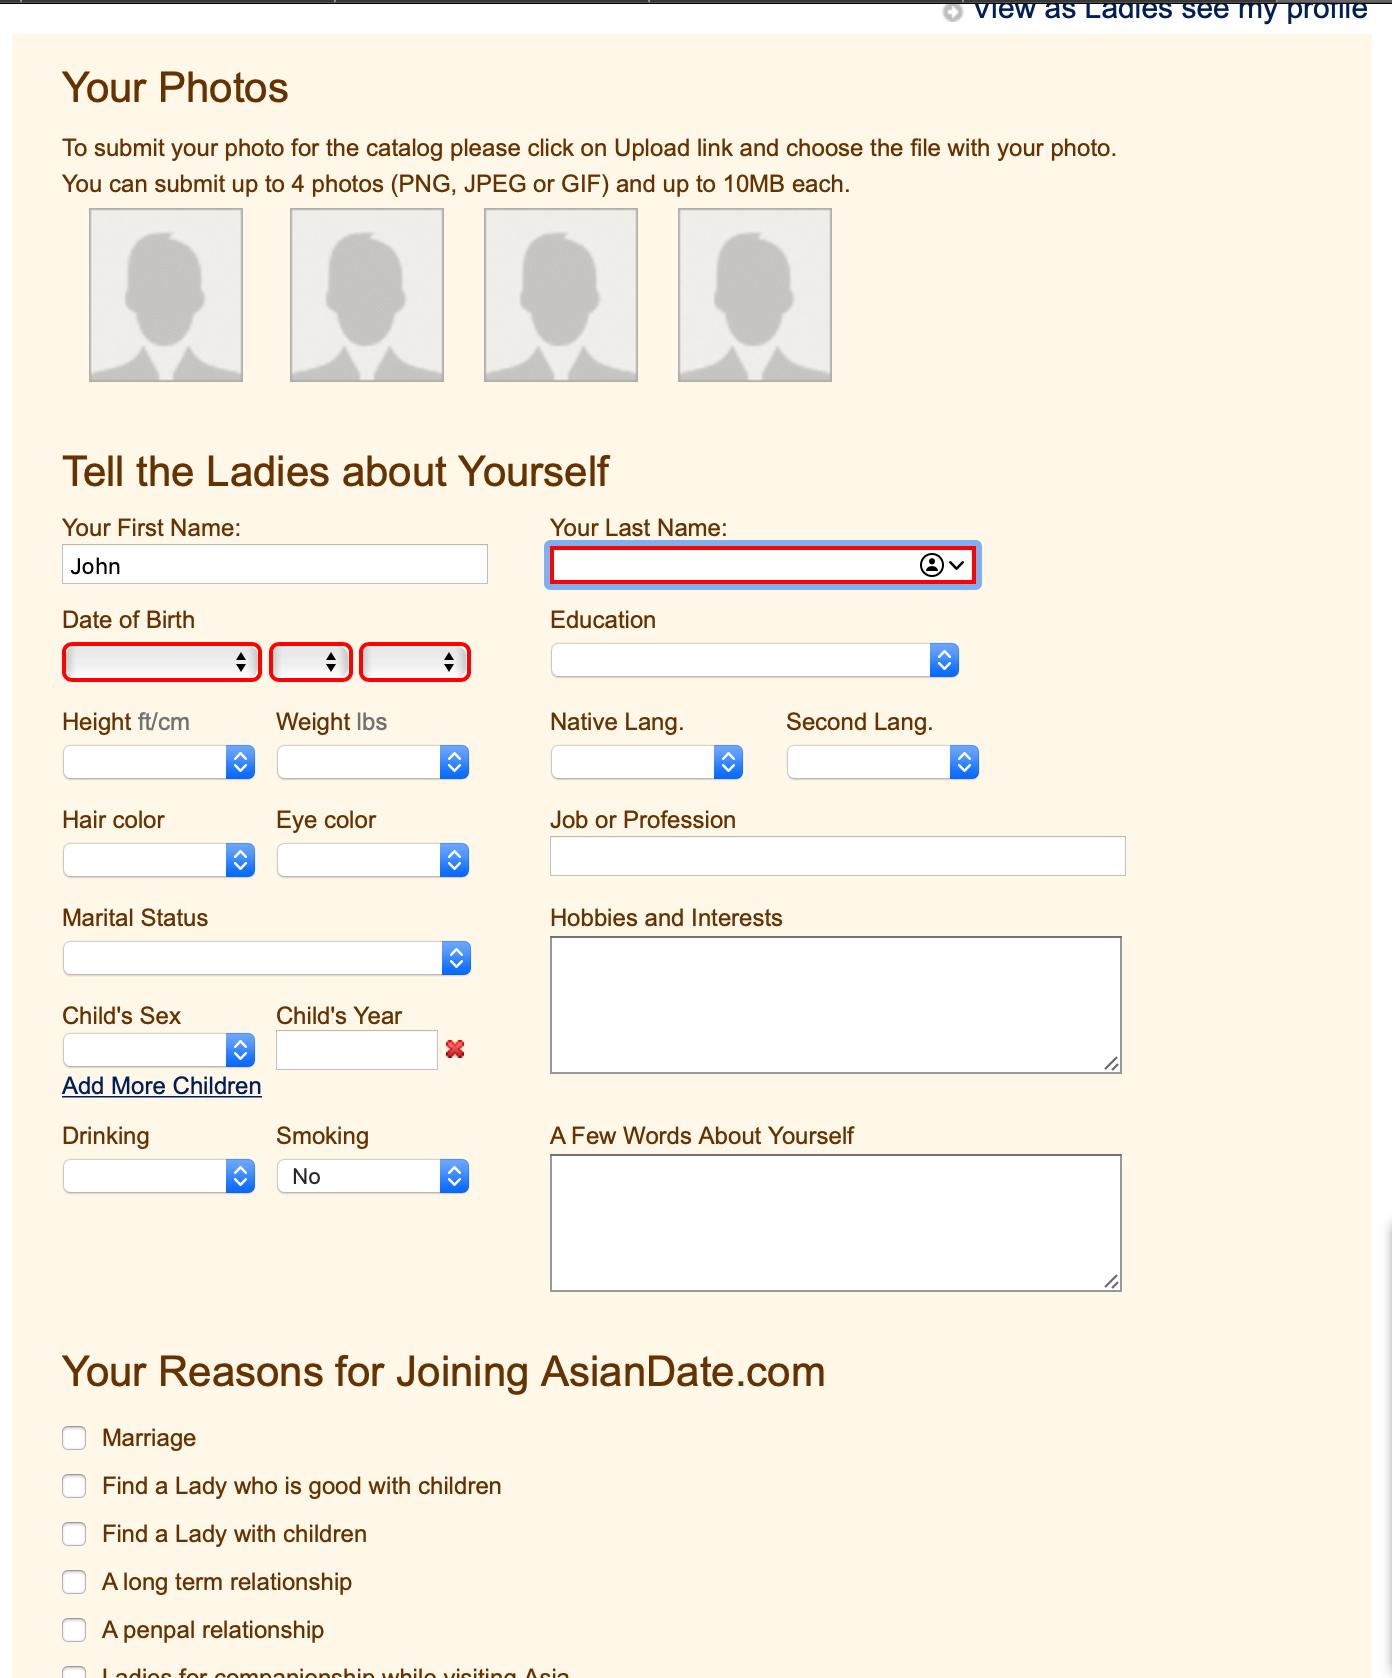 asiandate member information